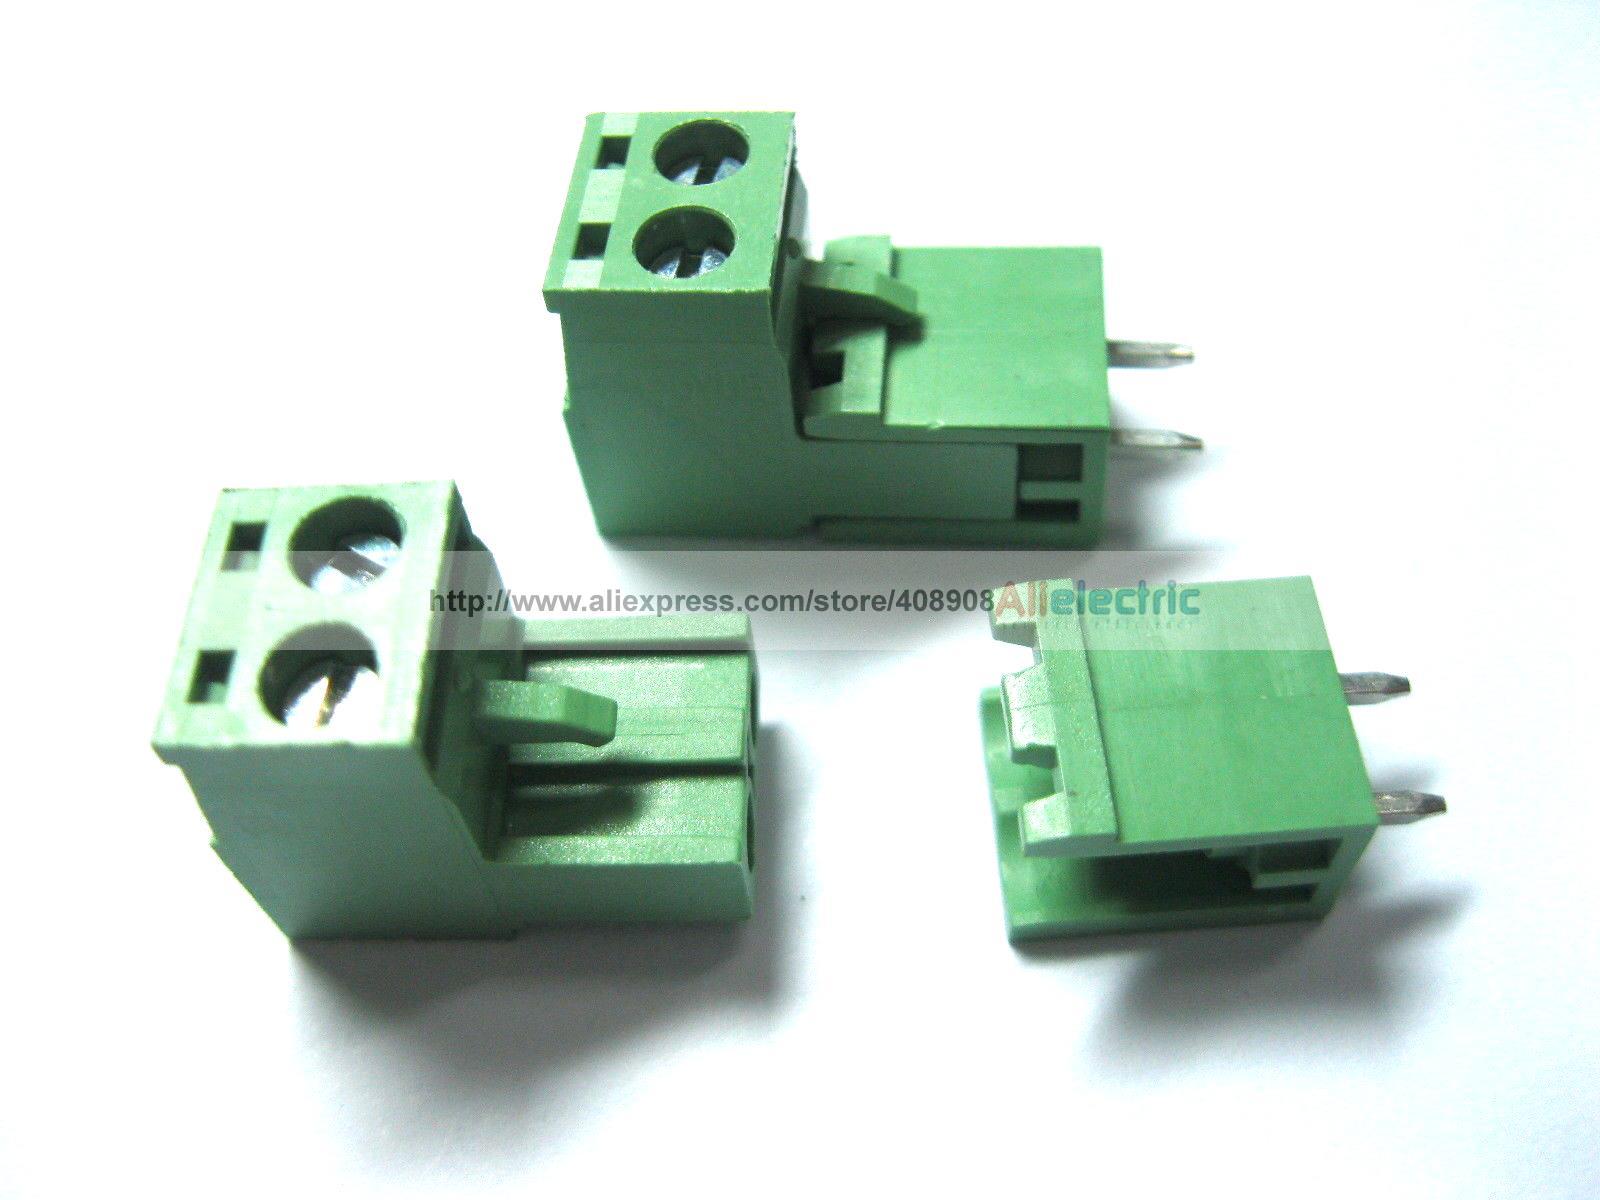 100 Pcs Green 2pin 5.08mm Screw Terminal Block Connector 3 pin curved screw terminal block connectors green 20 piece pack